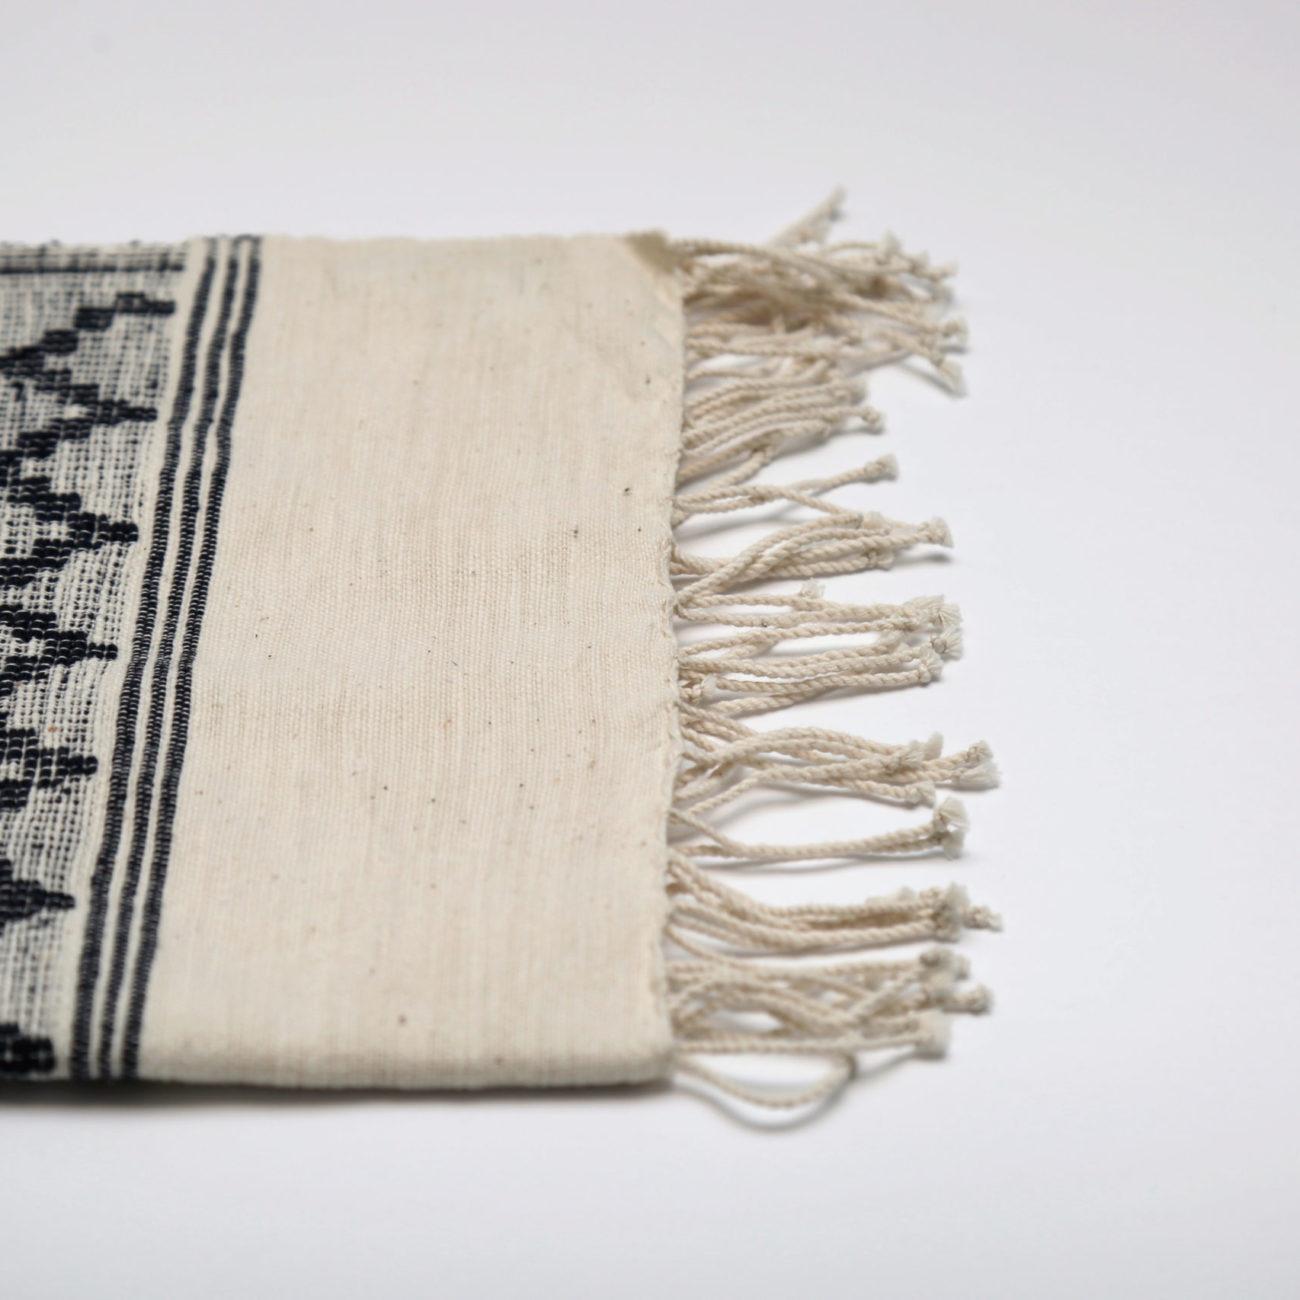 Artisinal Cotton Hand Towel